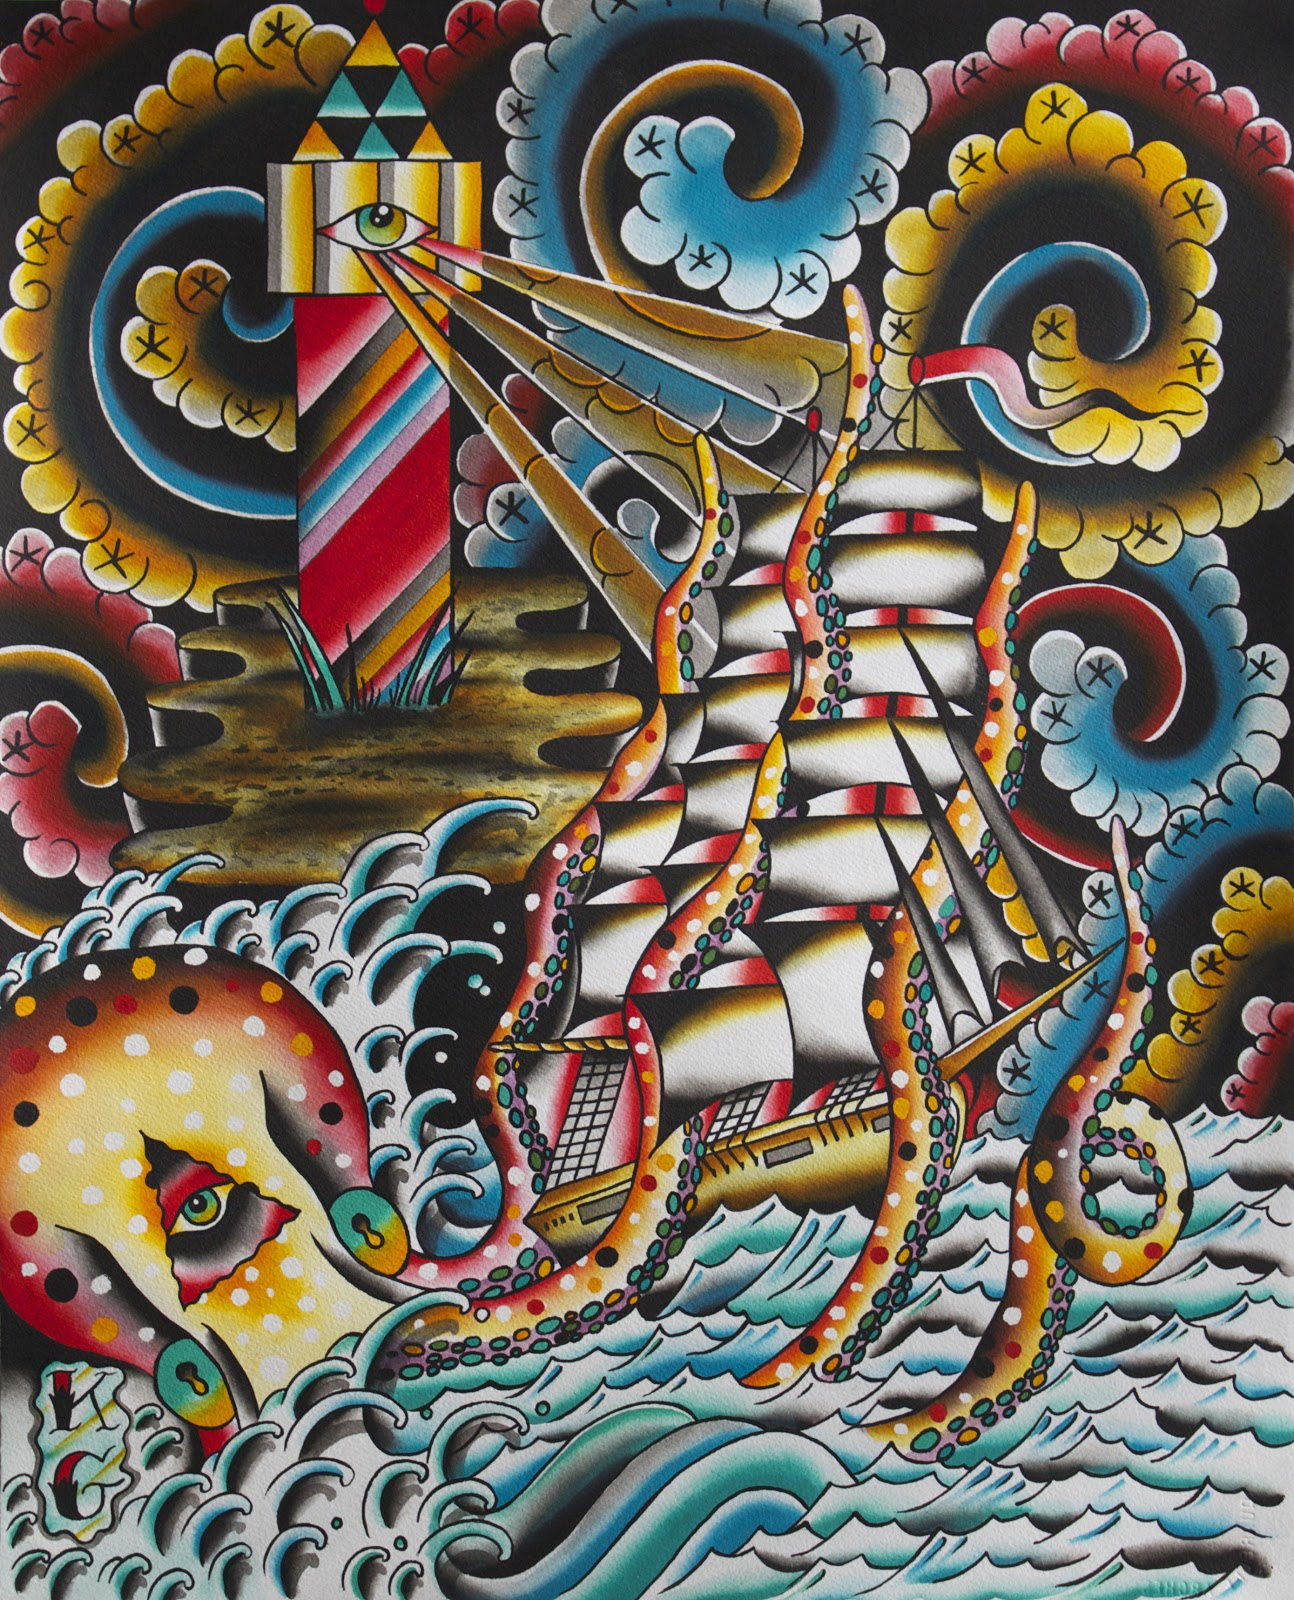 New original paintings for sale kurt gardiner for Original artwork for sale online